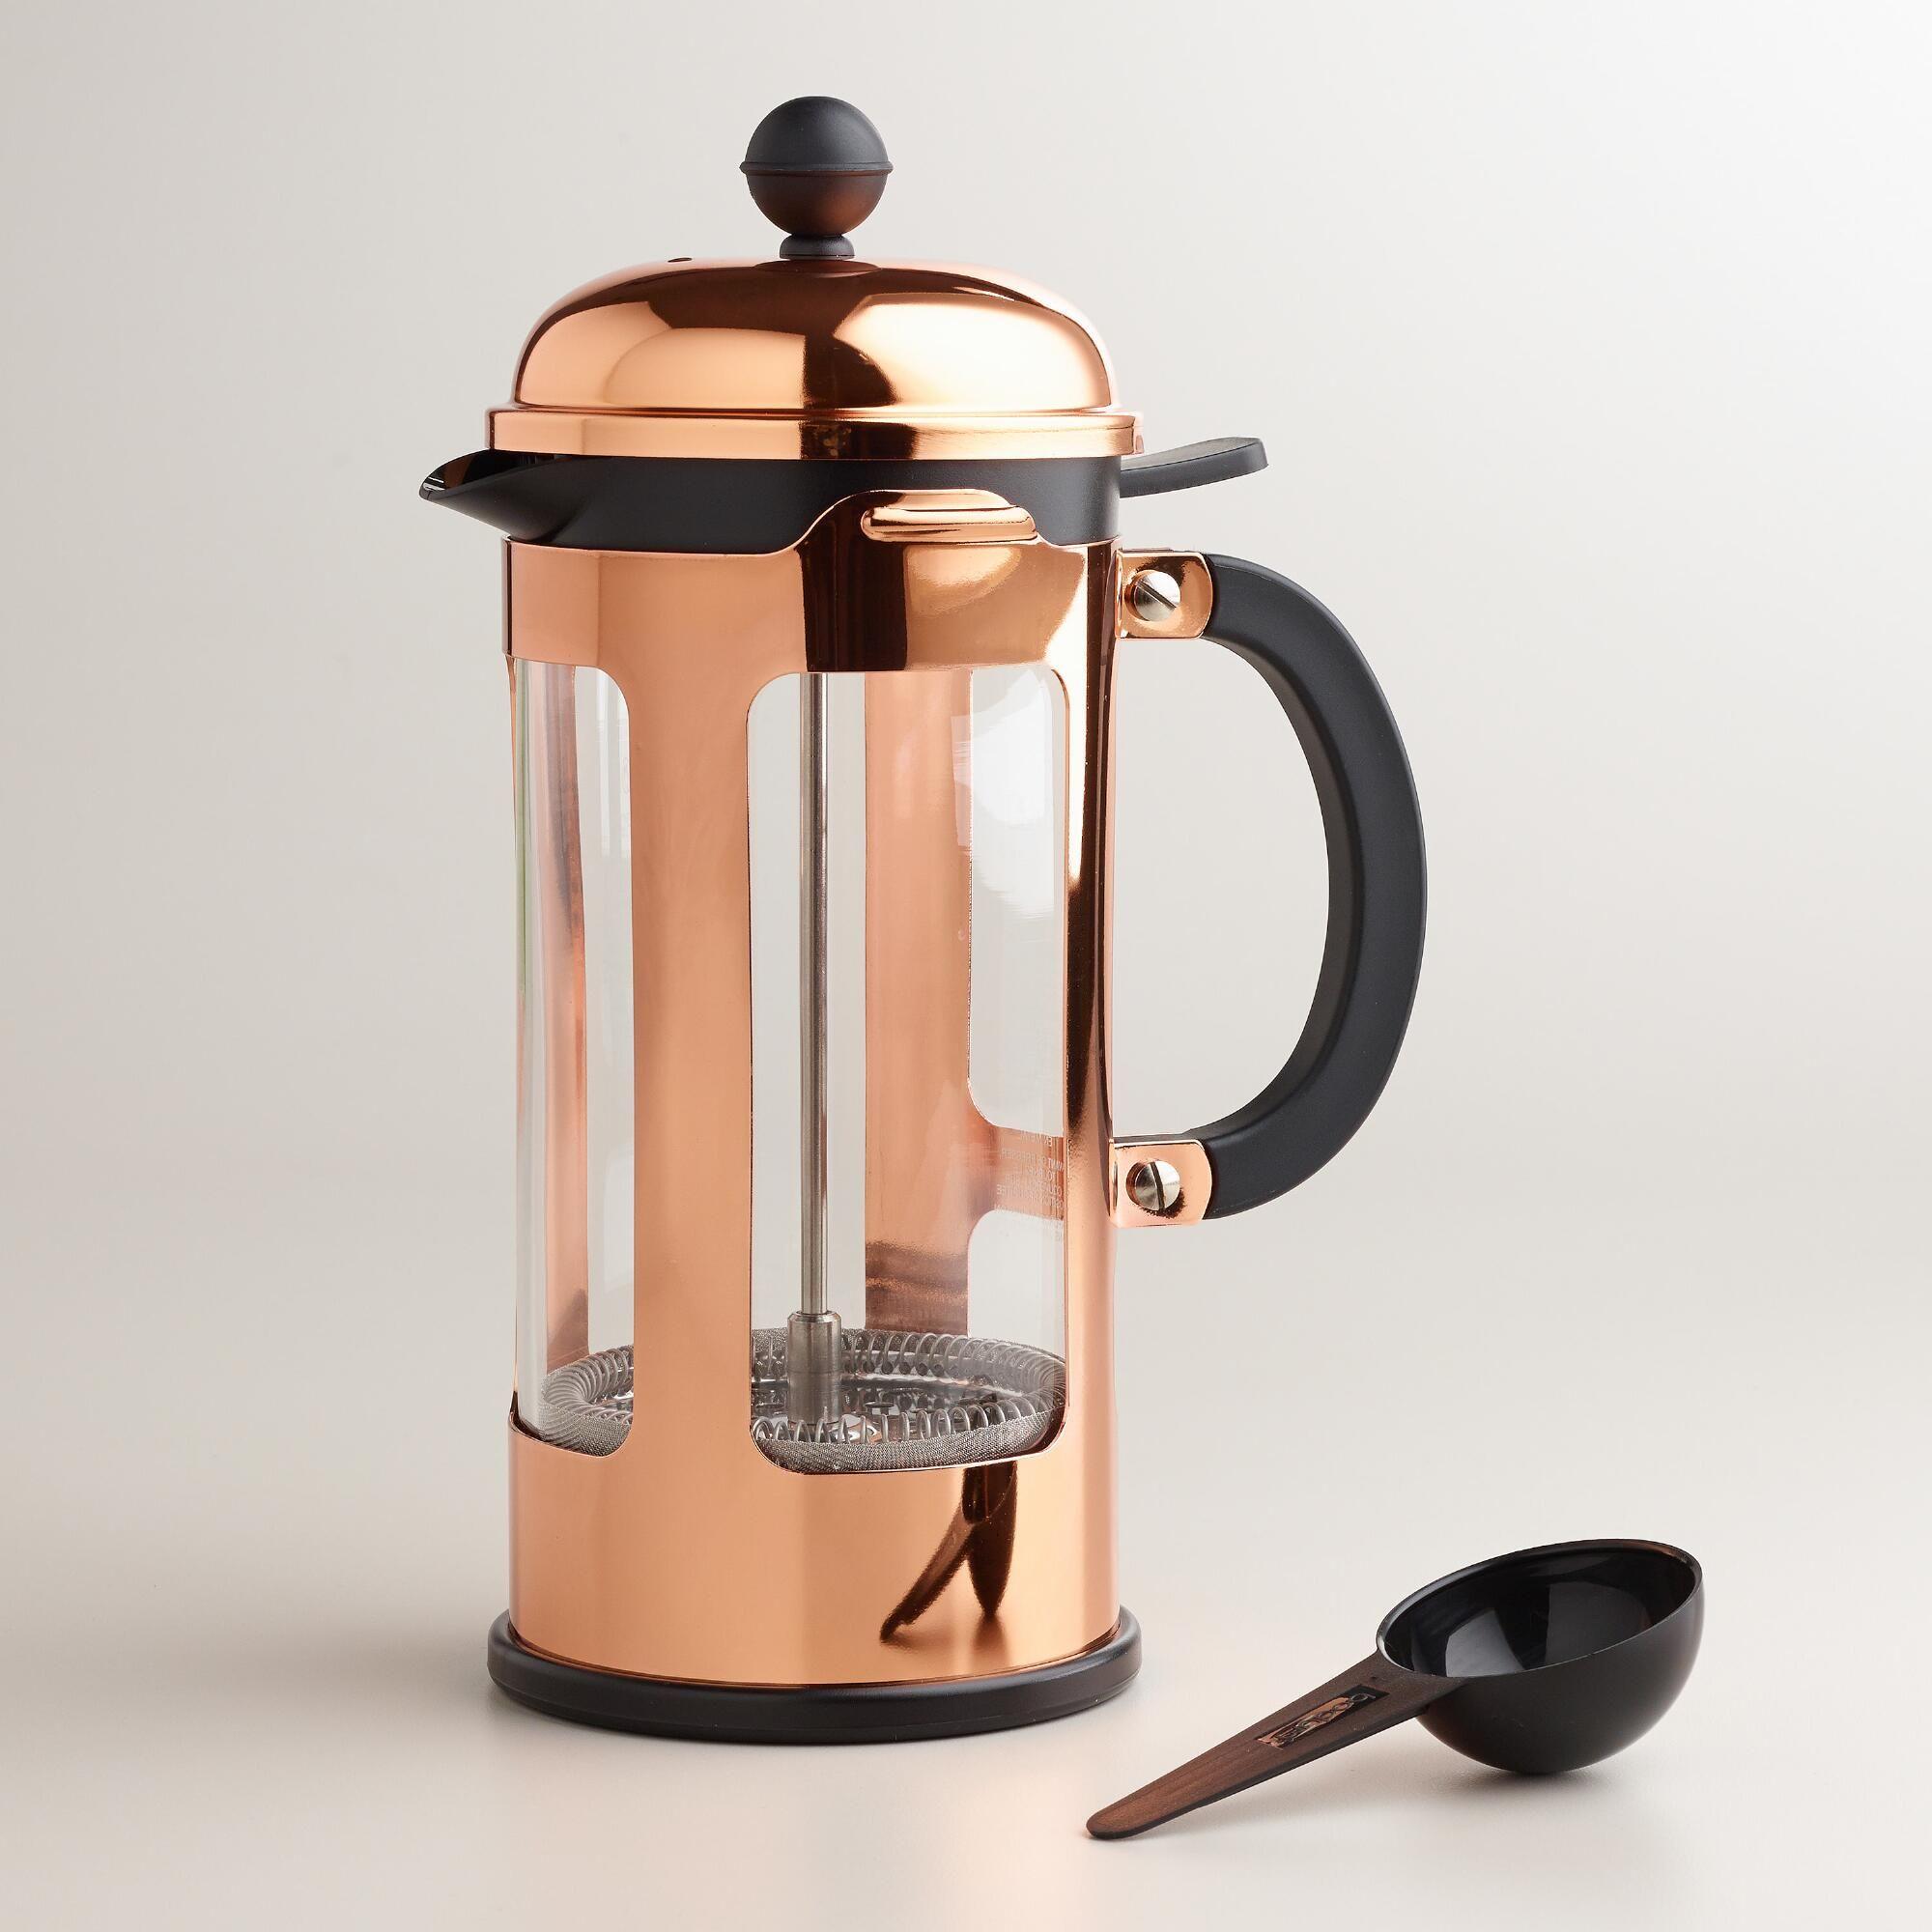 bodum chambord copper 8 cup french press coffee maker french press coffee maker french press. Black Bedroom Furniture Sets. Home Design Ideas